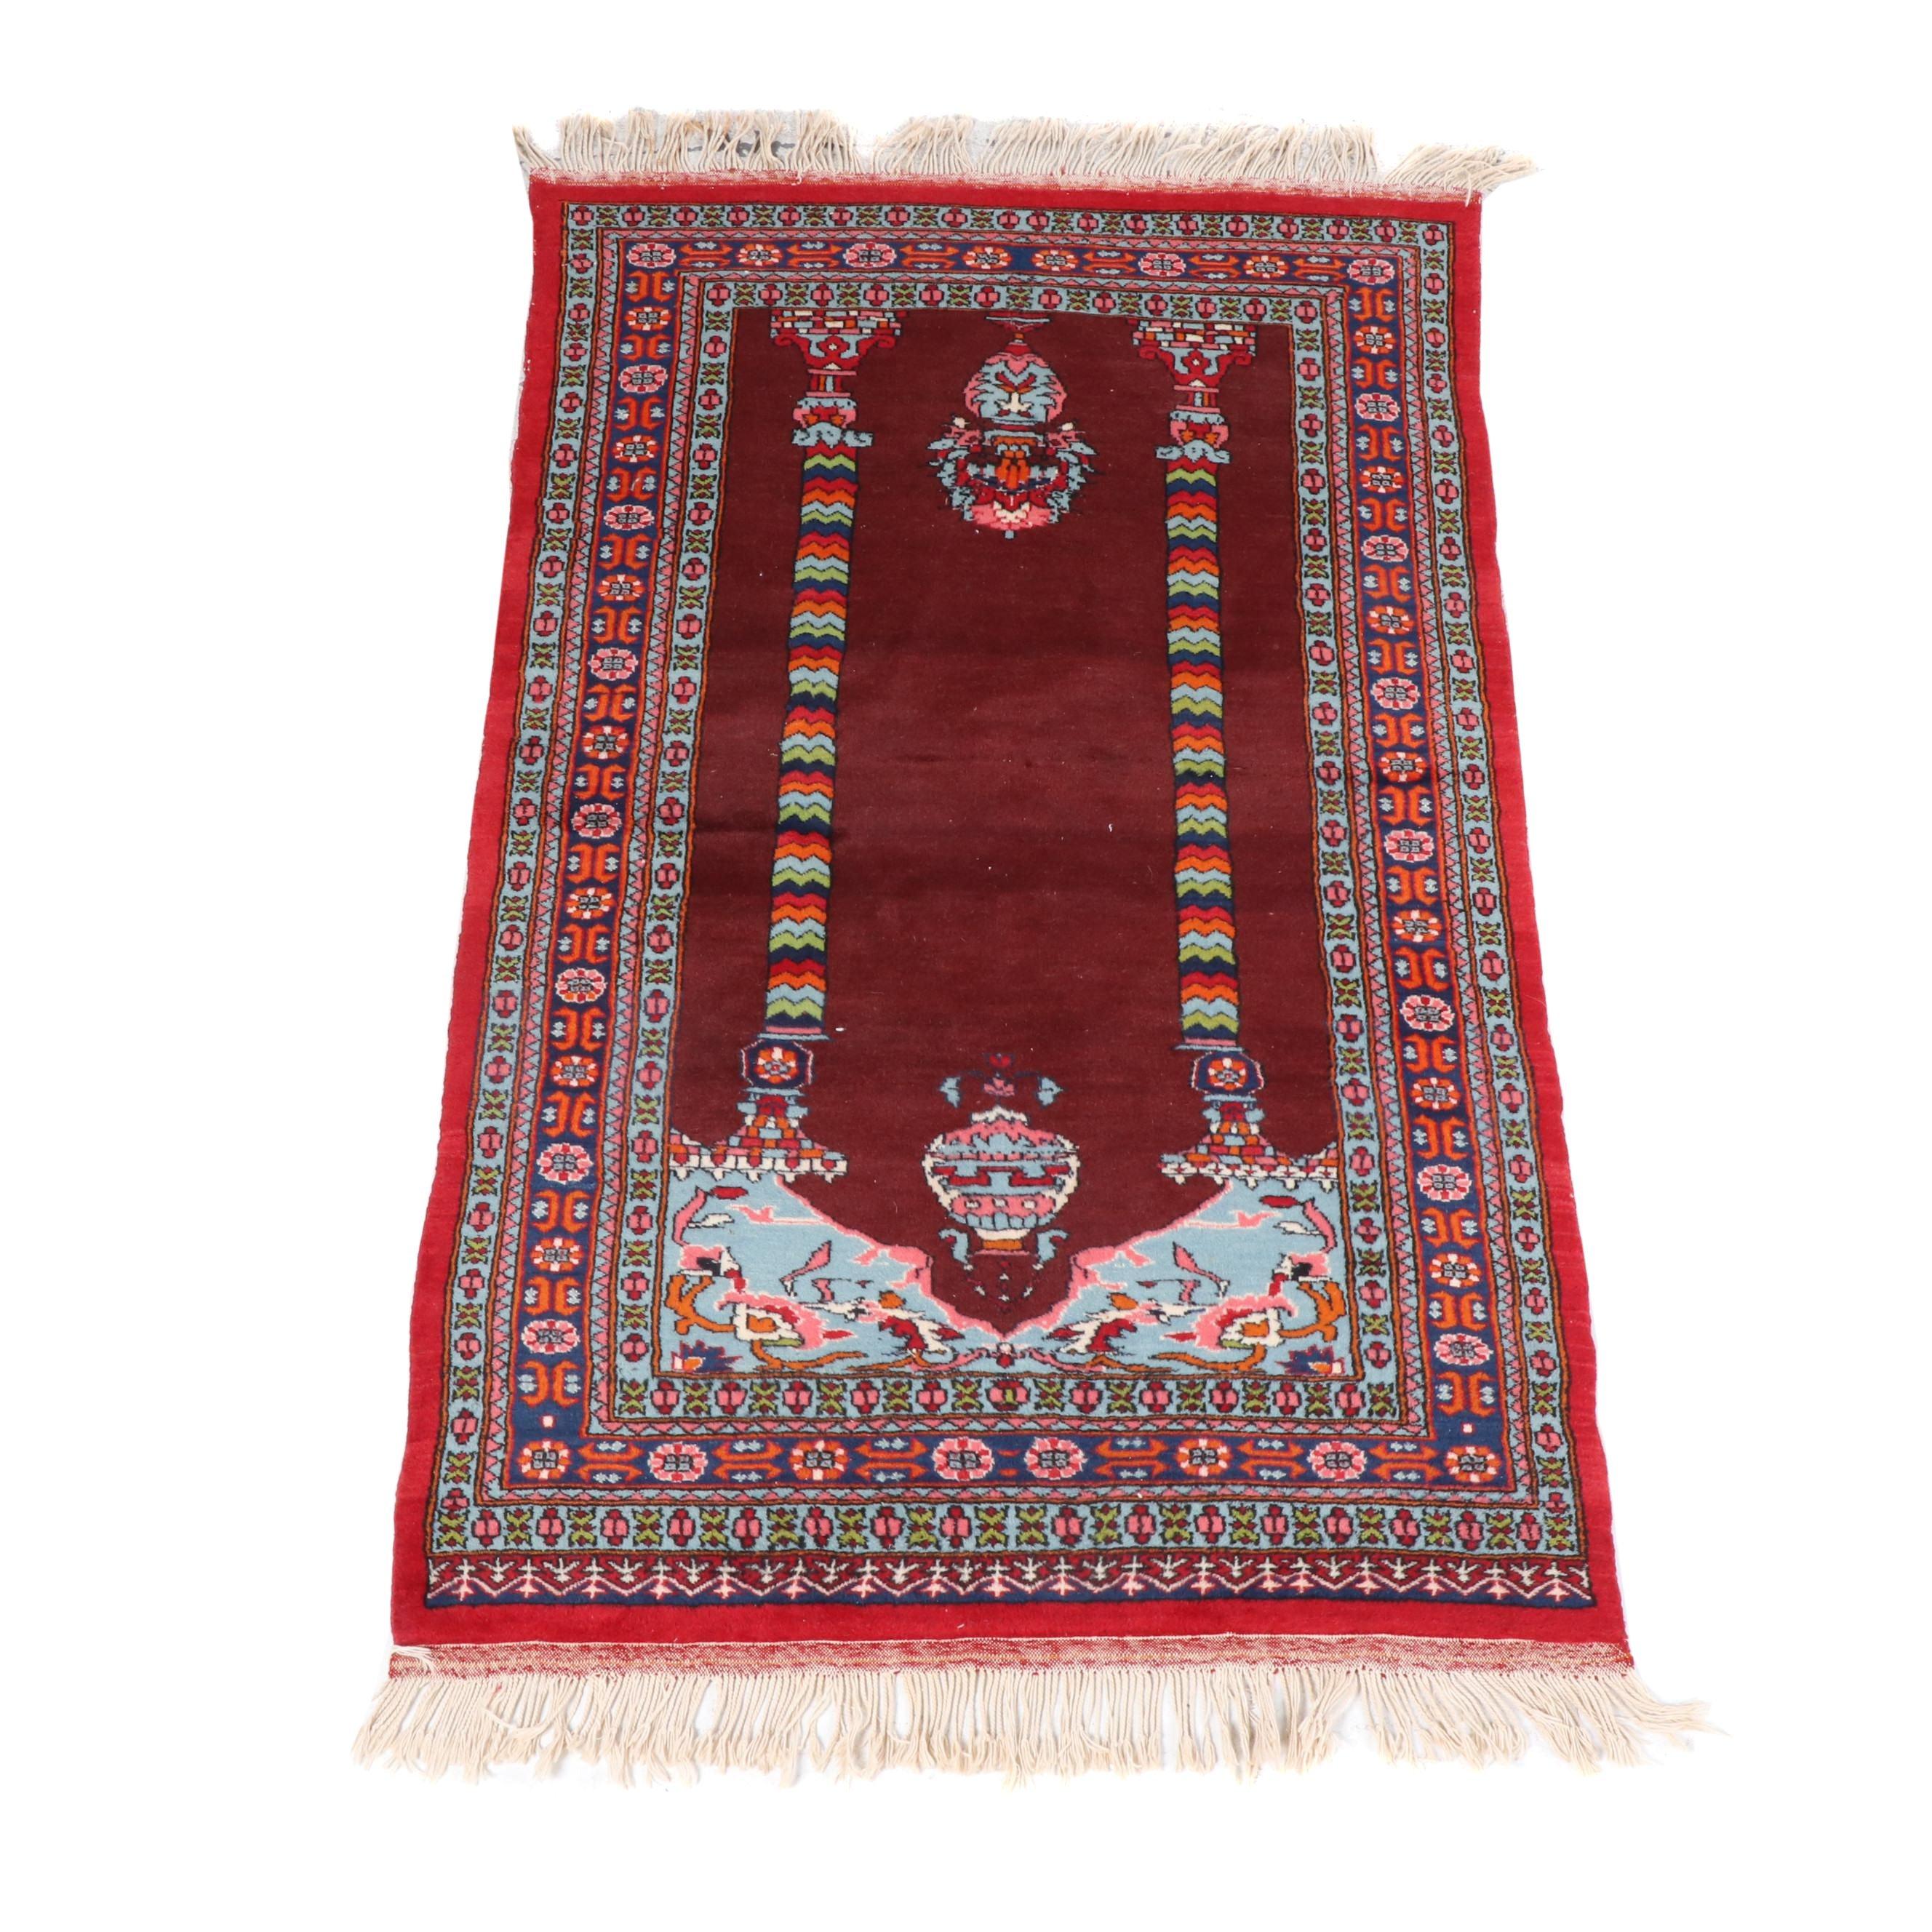 Hand-Knotted Turkish Wool Prayer Rug